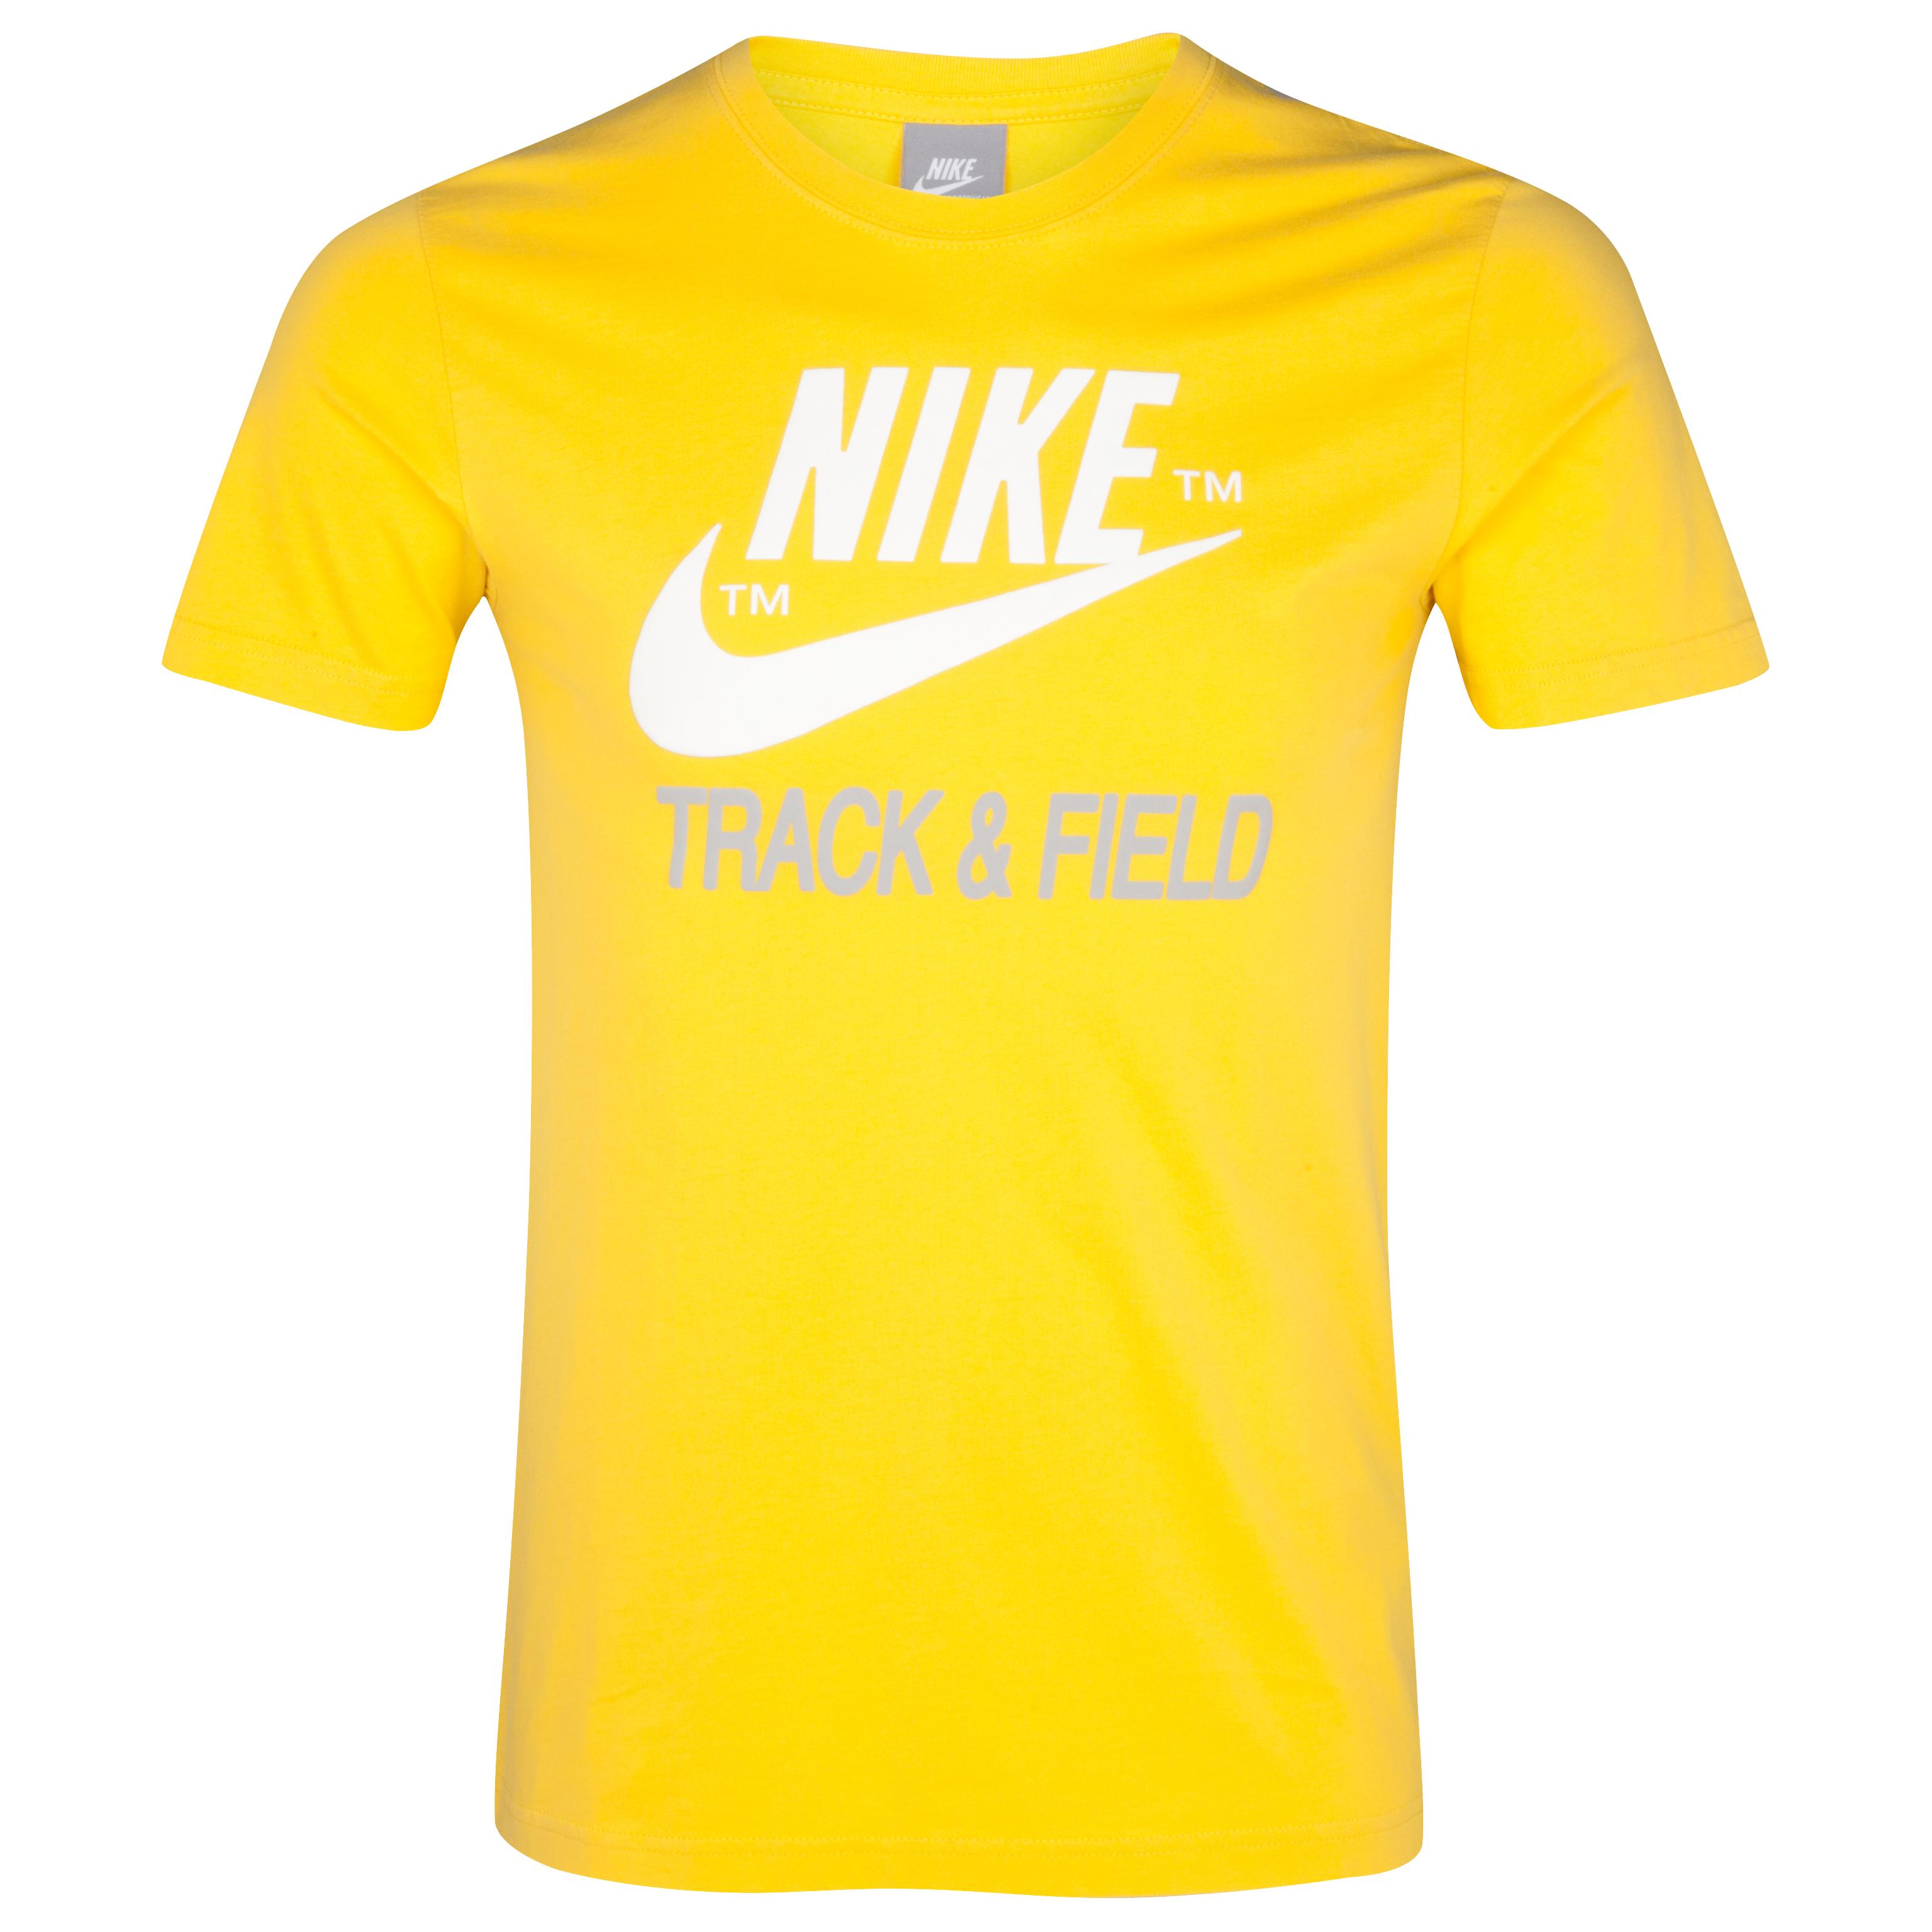 Nike NTF T-Shirt - Vivid Sulphur Yellow/Grey